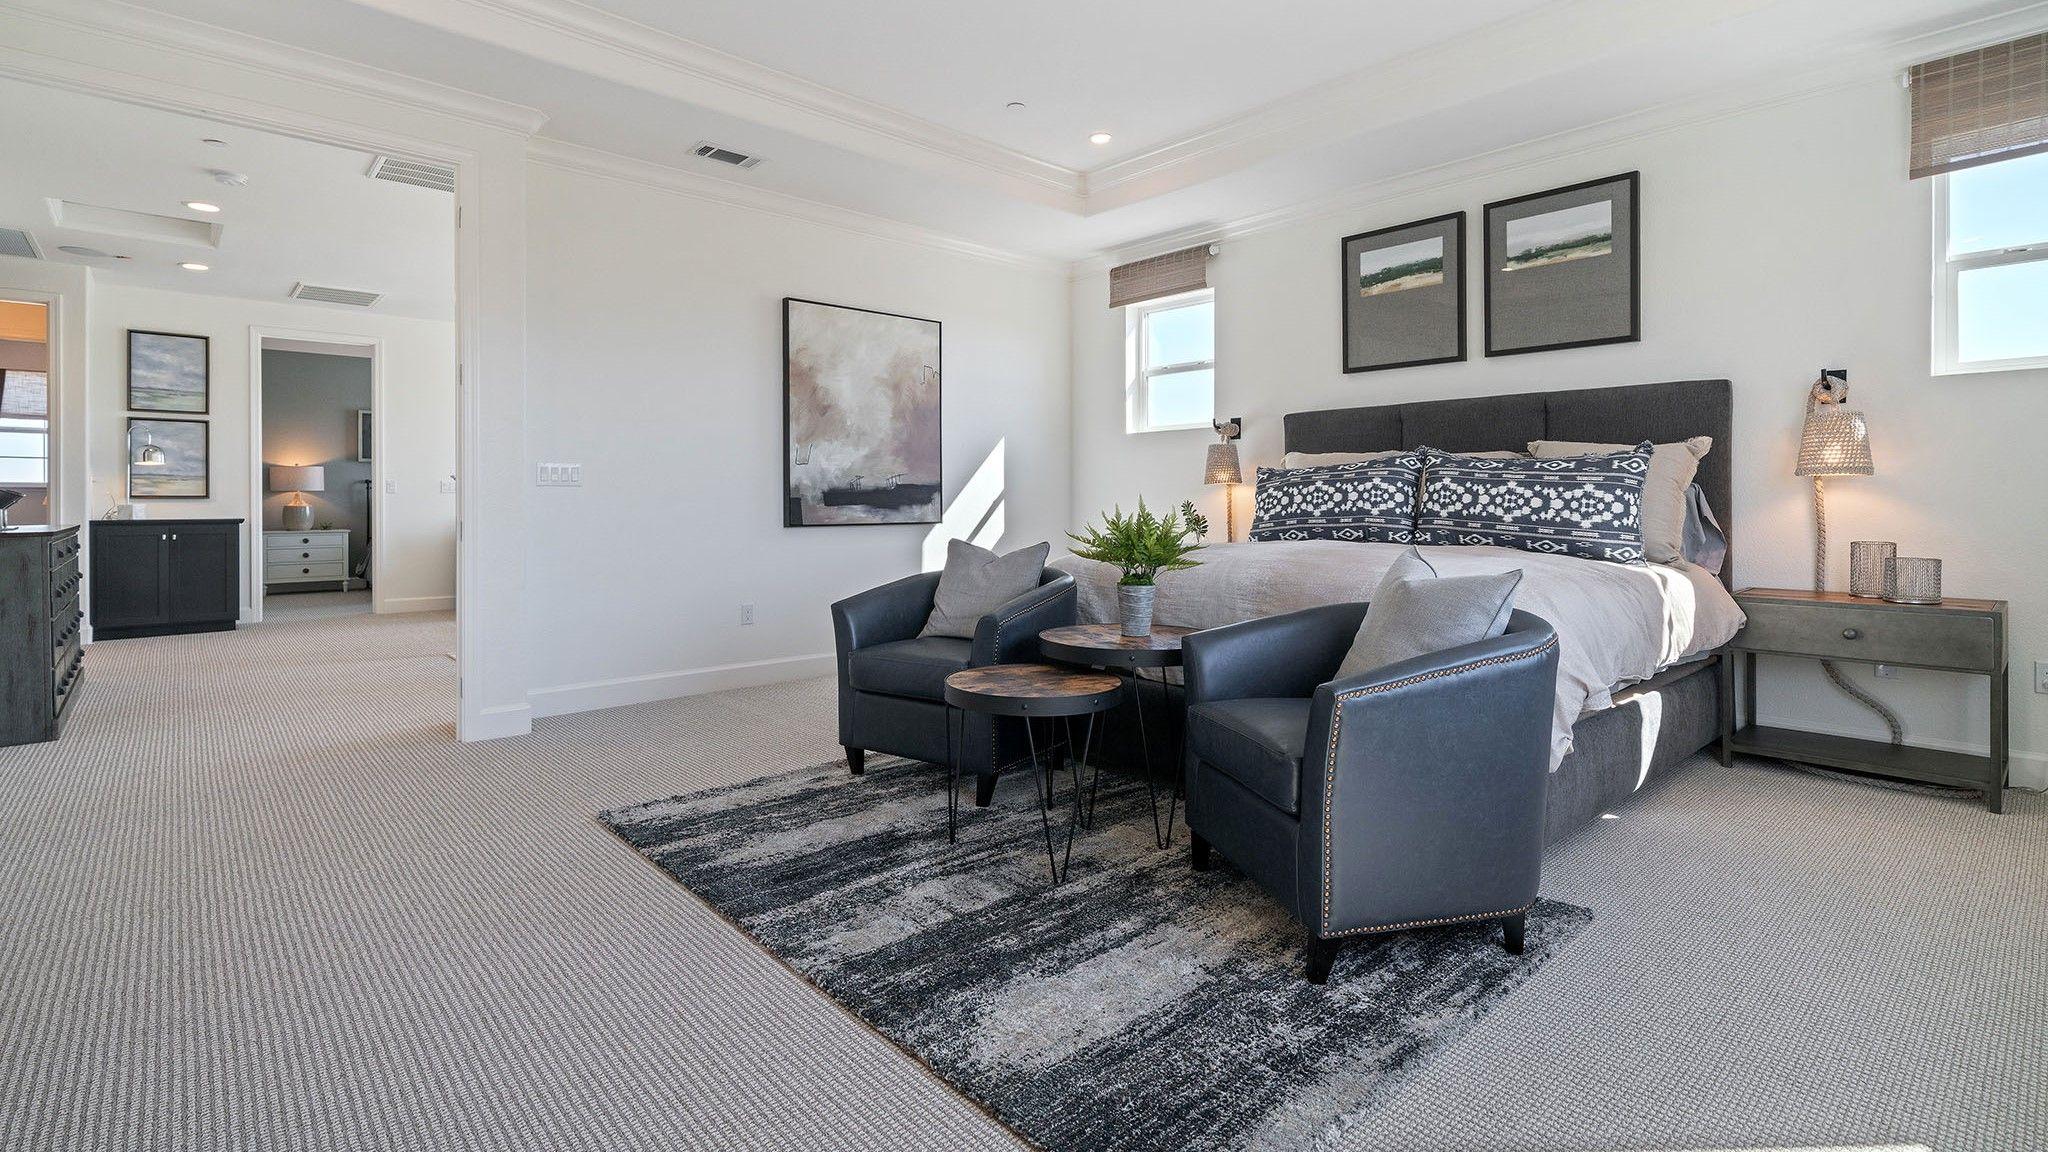 Bedroom featured in the Barton By Seeno Homes in Vallejo-Napa, CA